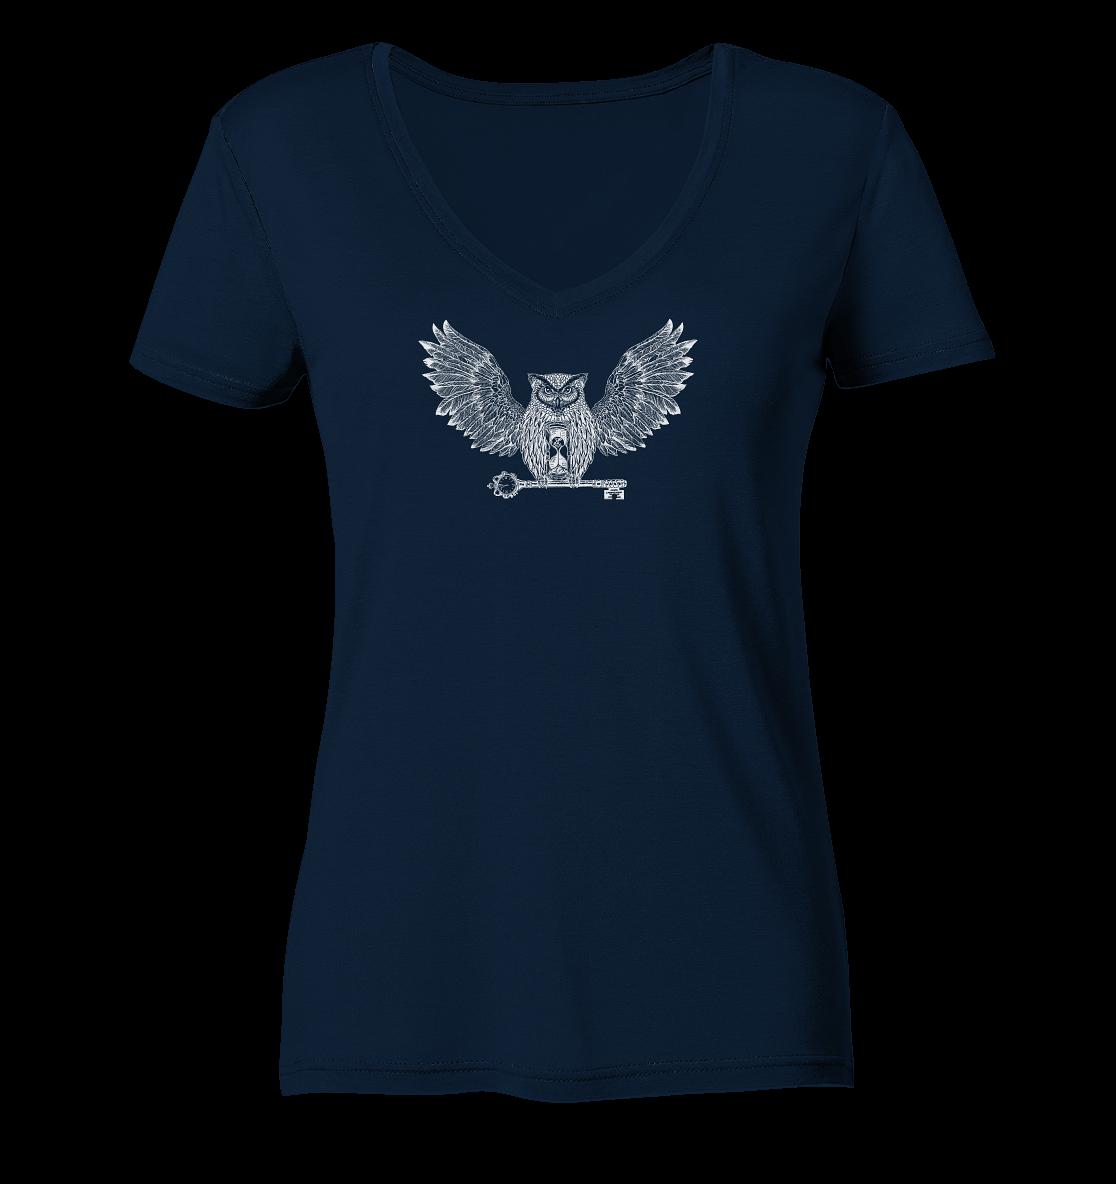 front-ladies-organic-v-neck-shirt-0e2035-1116x-1.png